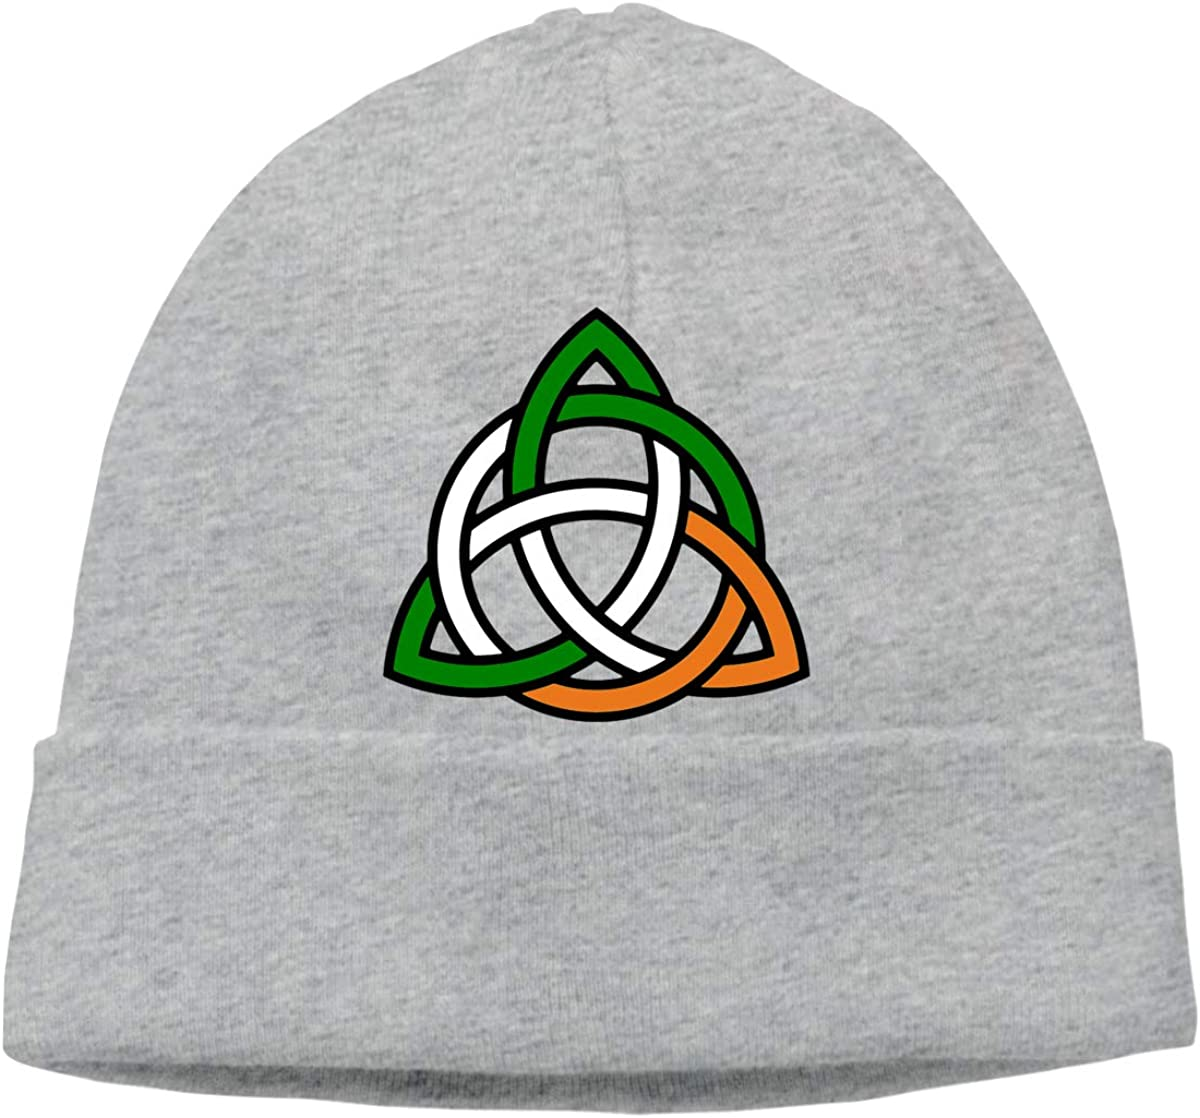 FORDSAN CP Celtic Knot Irish Mens Beanie Cap Skull Cap Winter Warm Knitting Hats.